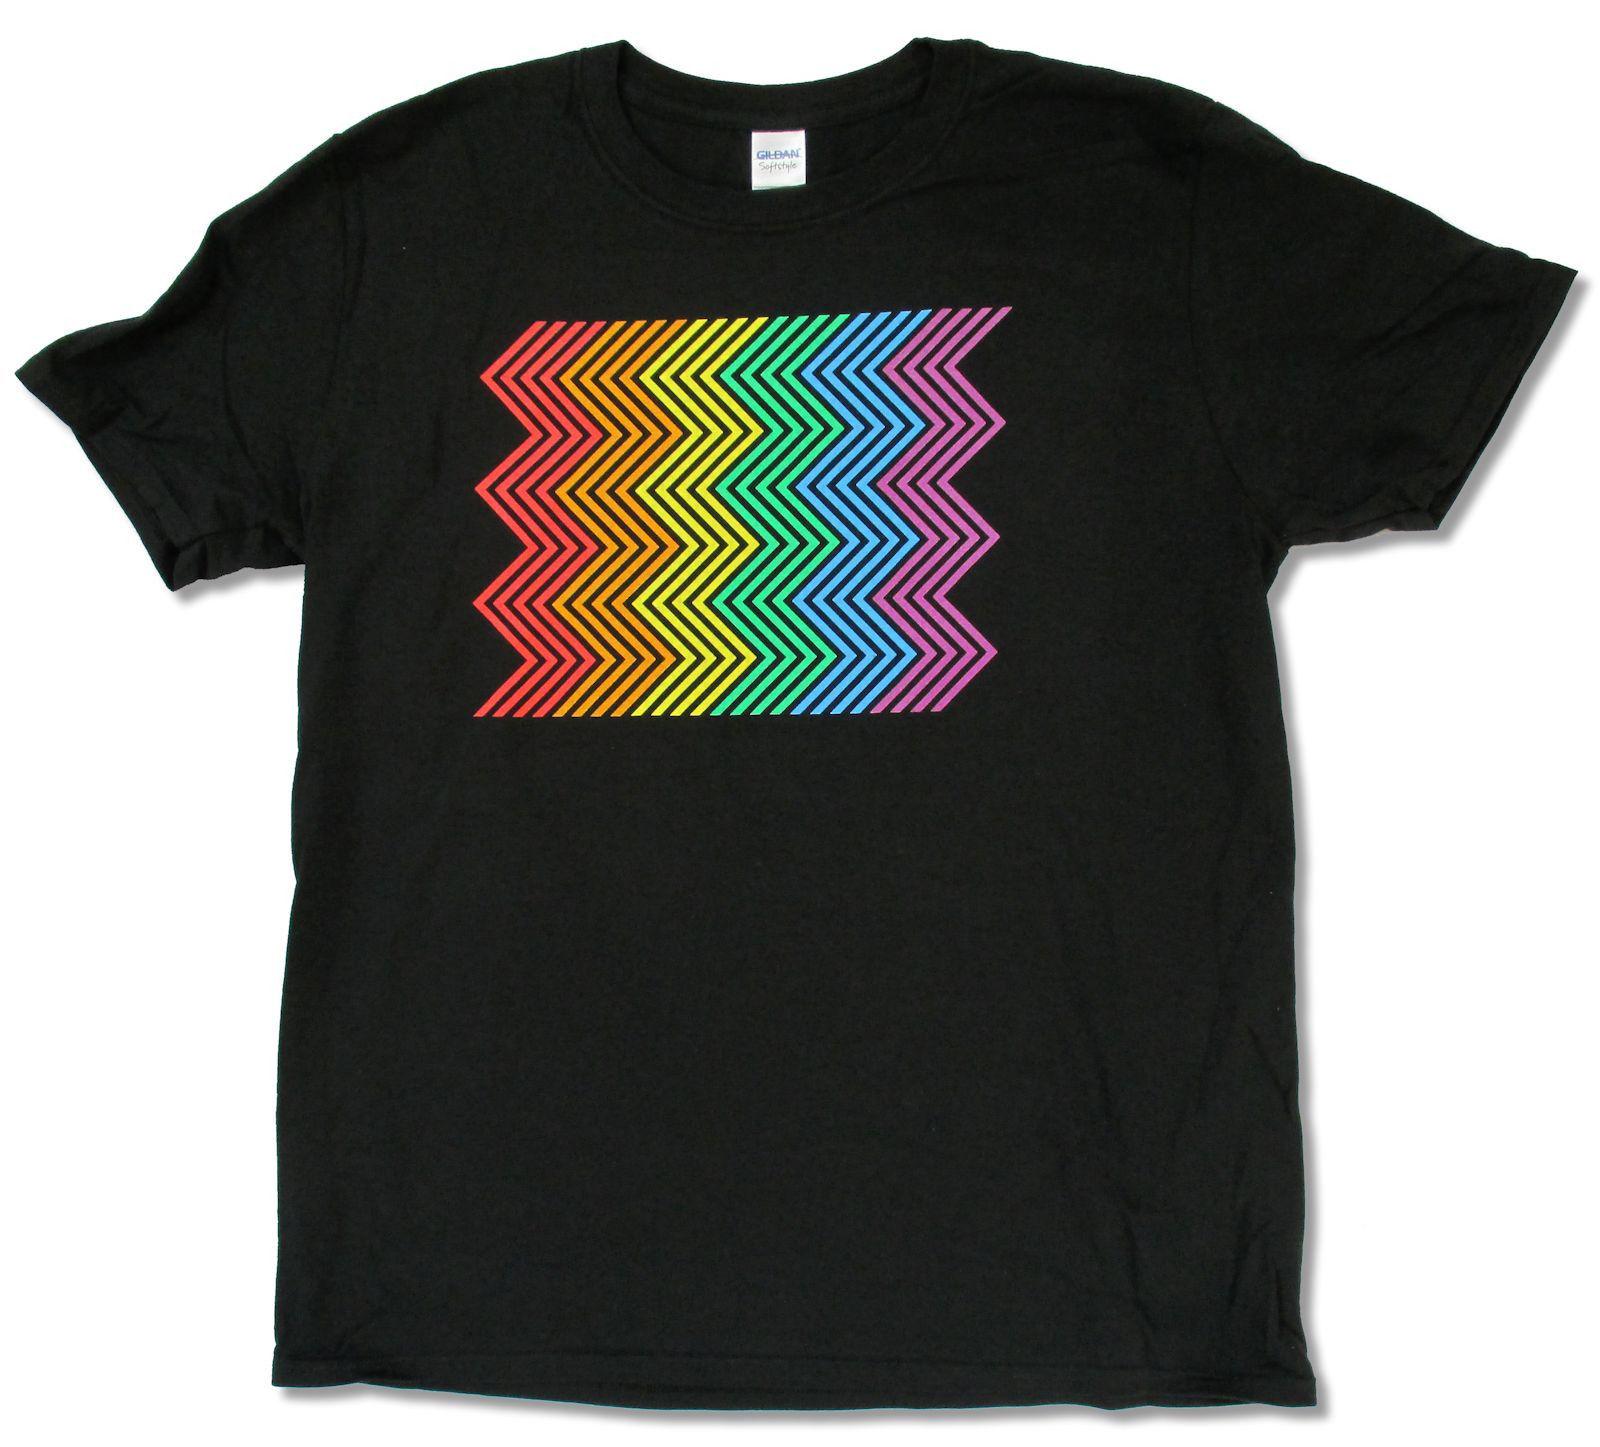 PET SHOP BOYS ELECTRIC RAINBOW TOUR 2014 BLACK T-SHIRT NEW OFFICIAL ADULT BAND Novelty Cool Tops Men Short Sleeve T shirt